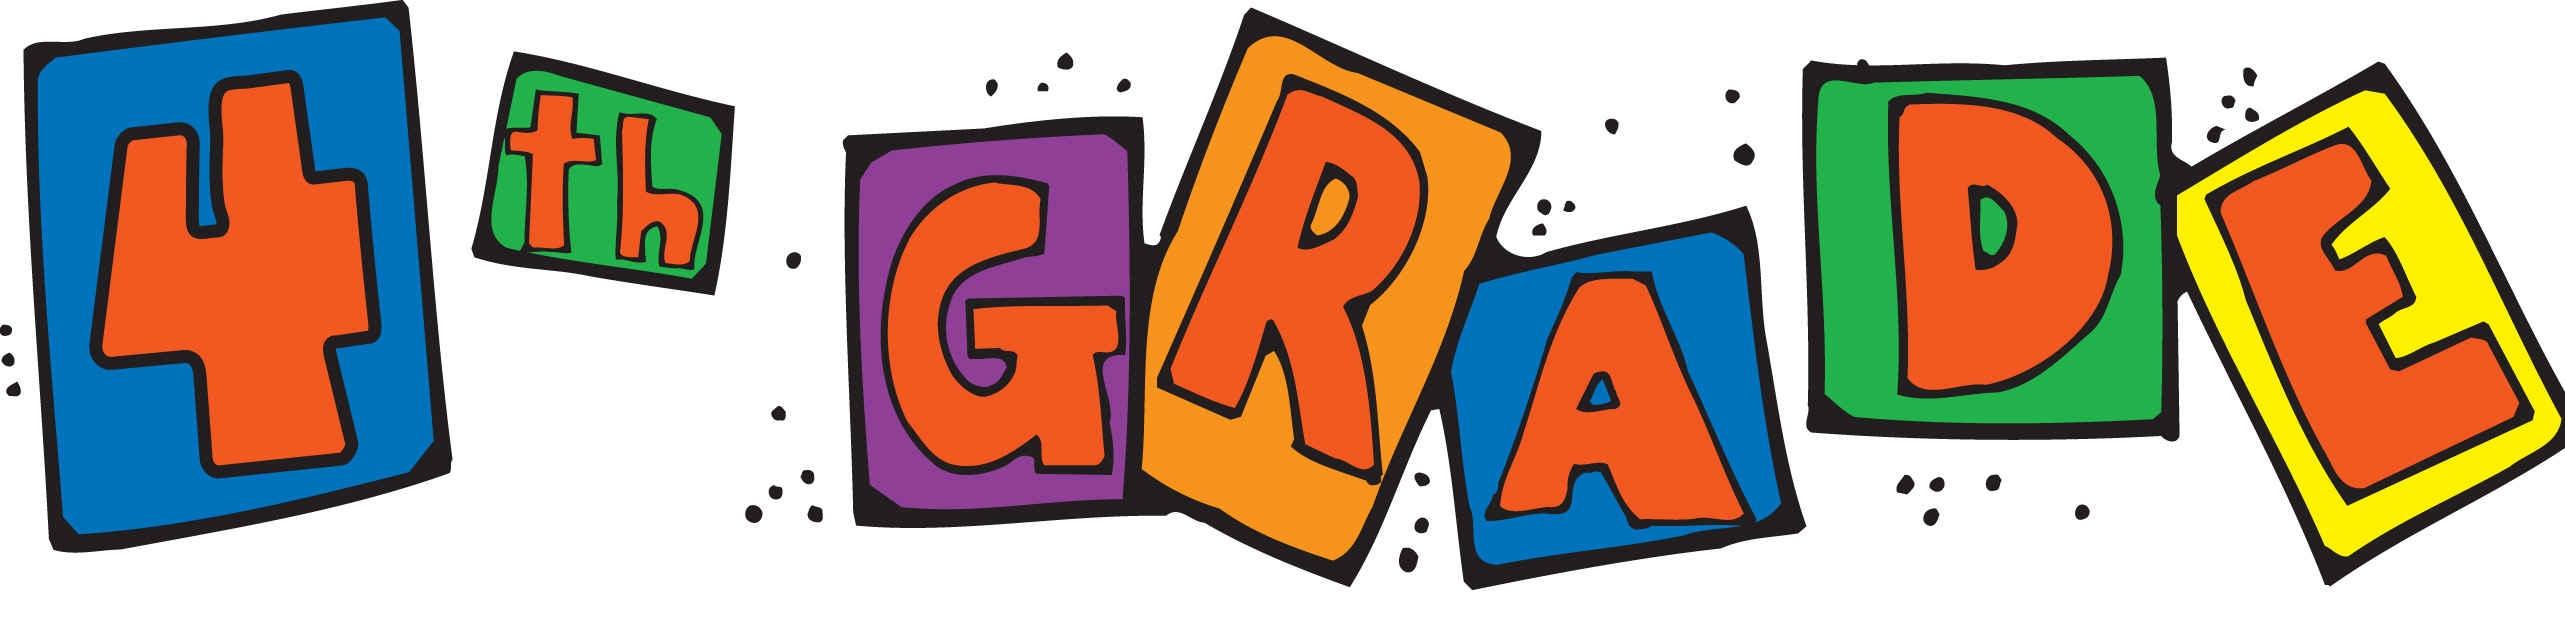 Free 4th Grade Cliparts, Download Free Clip Art, Free Clip Art on.